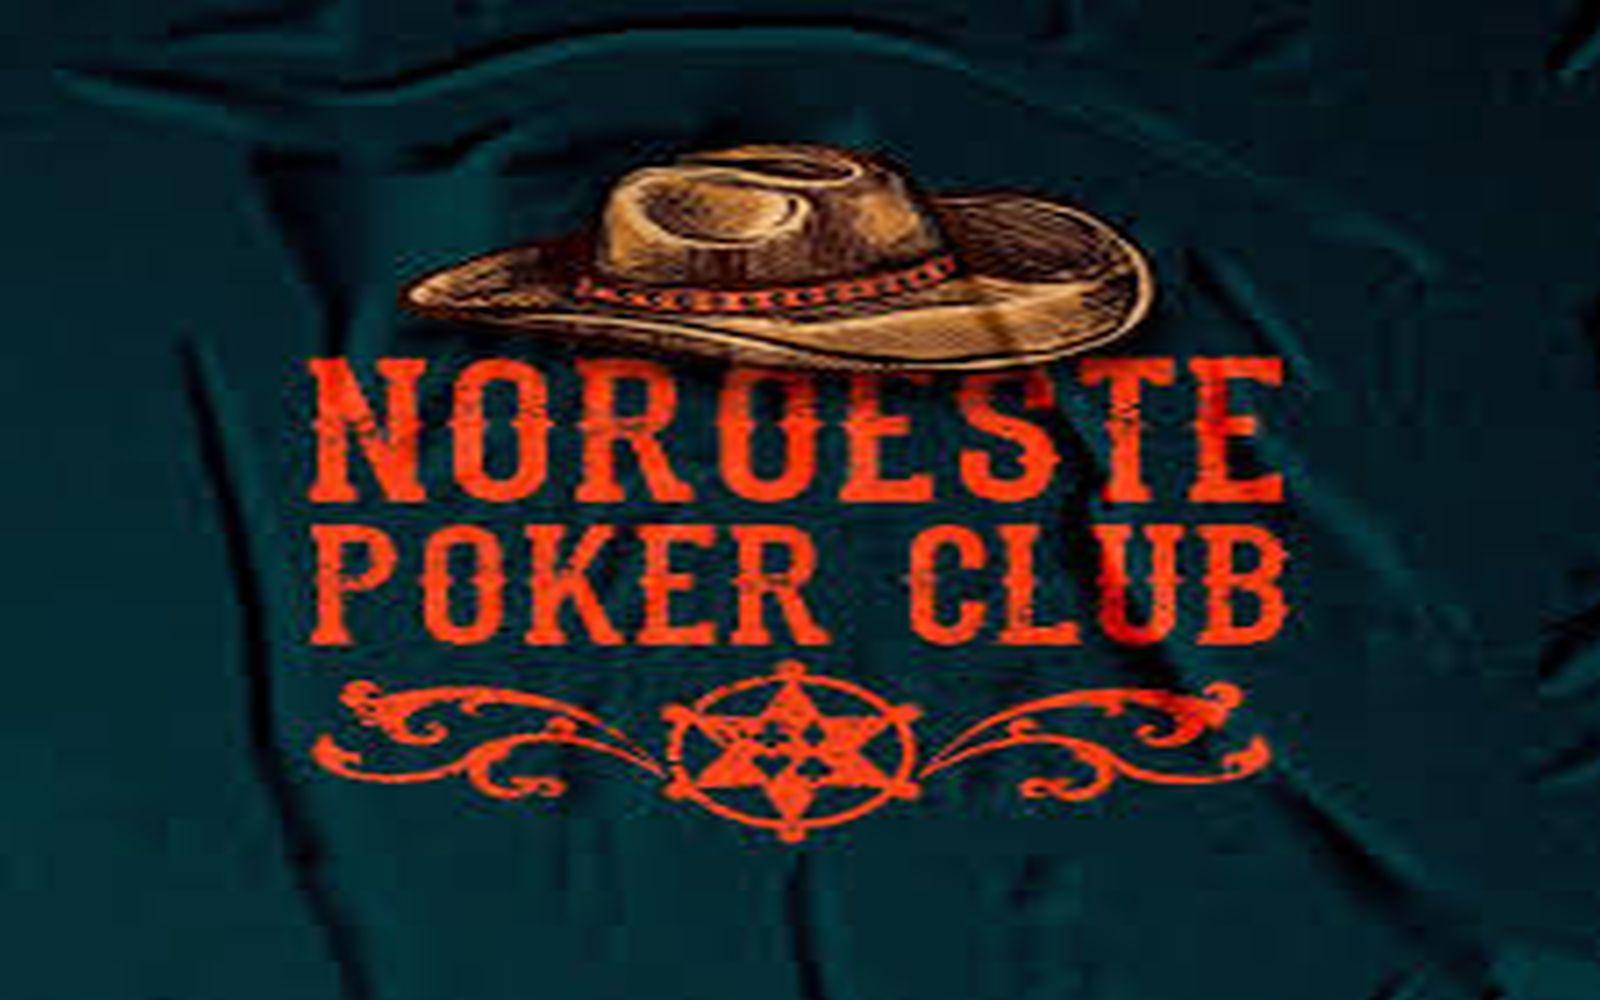 Noroeste Poker Club